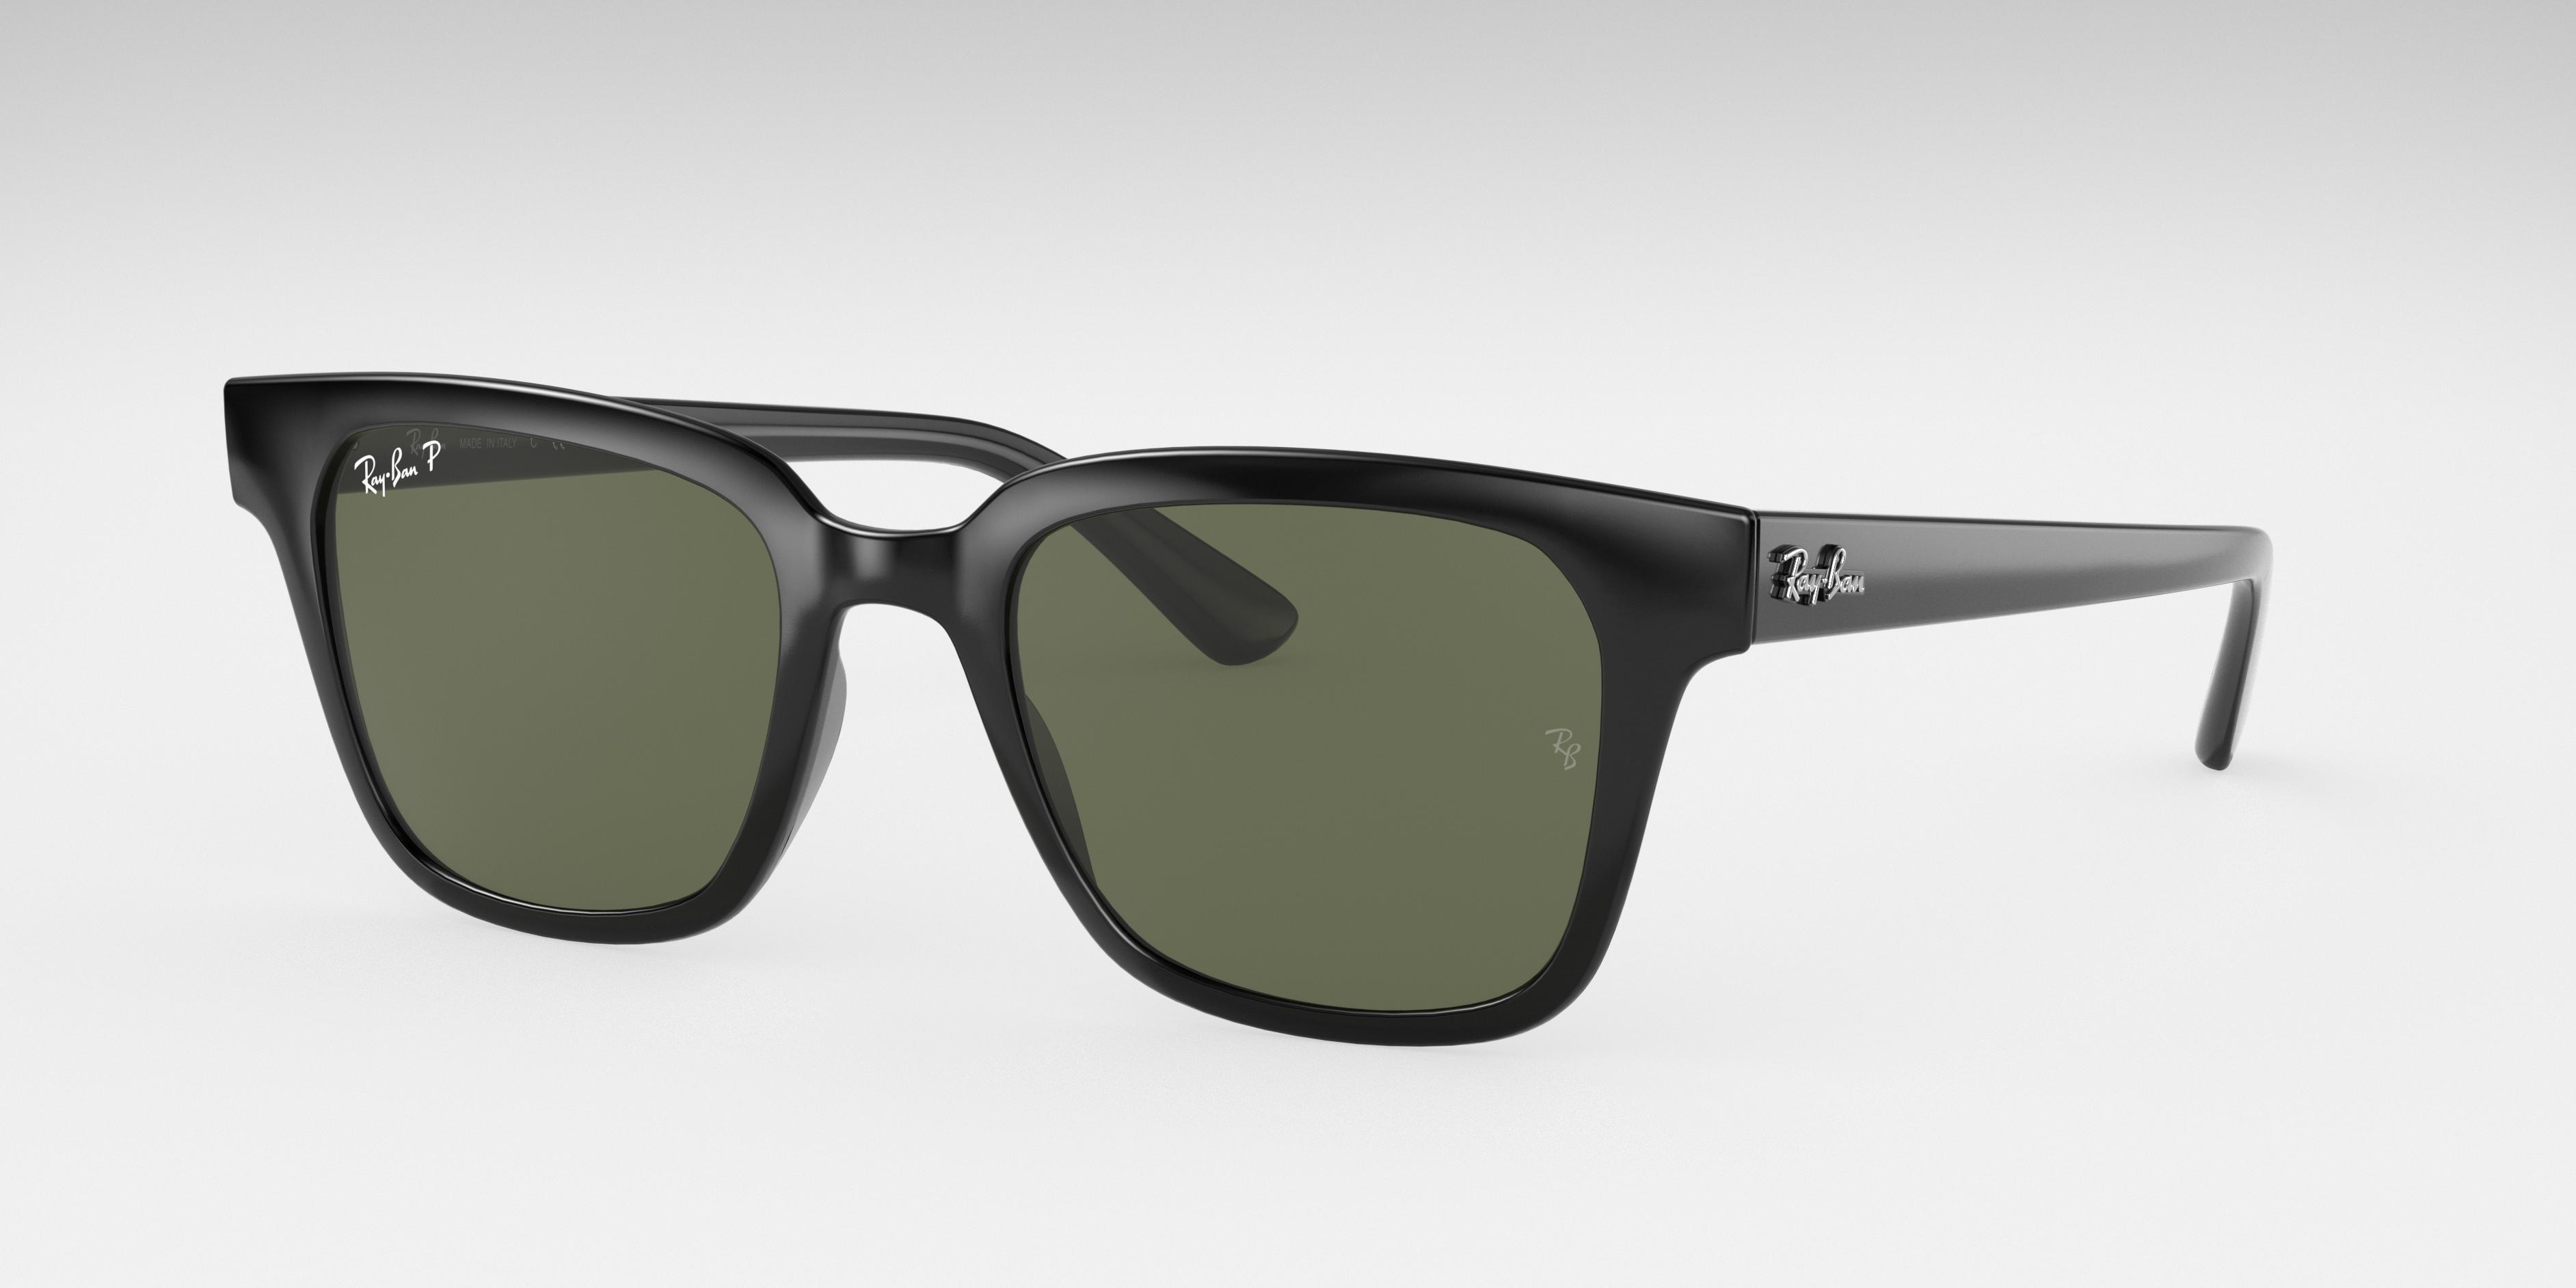 Ray-Ban Rb4323 Low Bridge Fit Black, Polarized Green Lenses - RB4323F